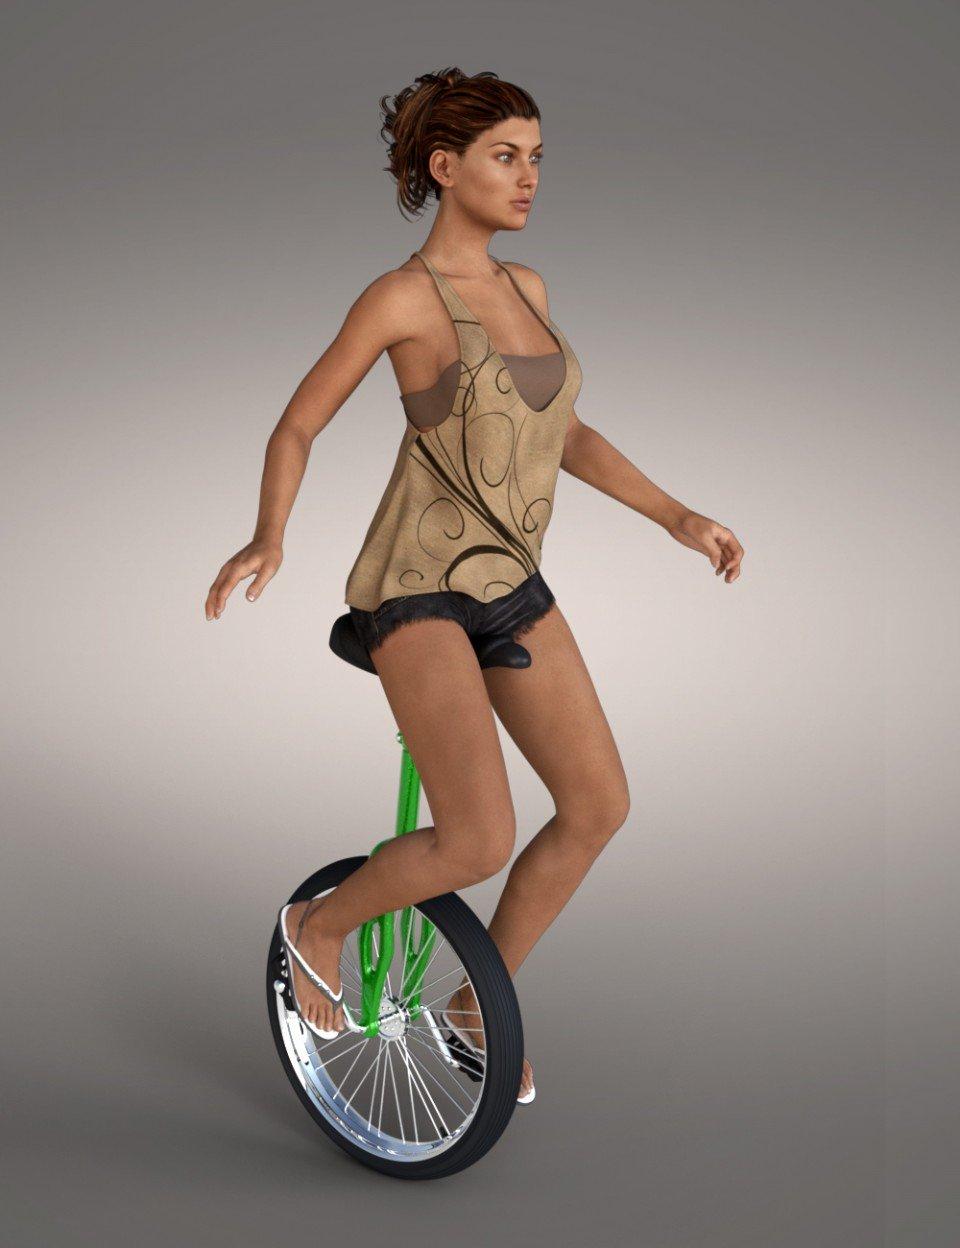 Unicycle_DAZ3D下载站